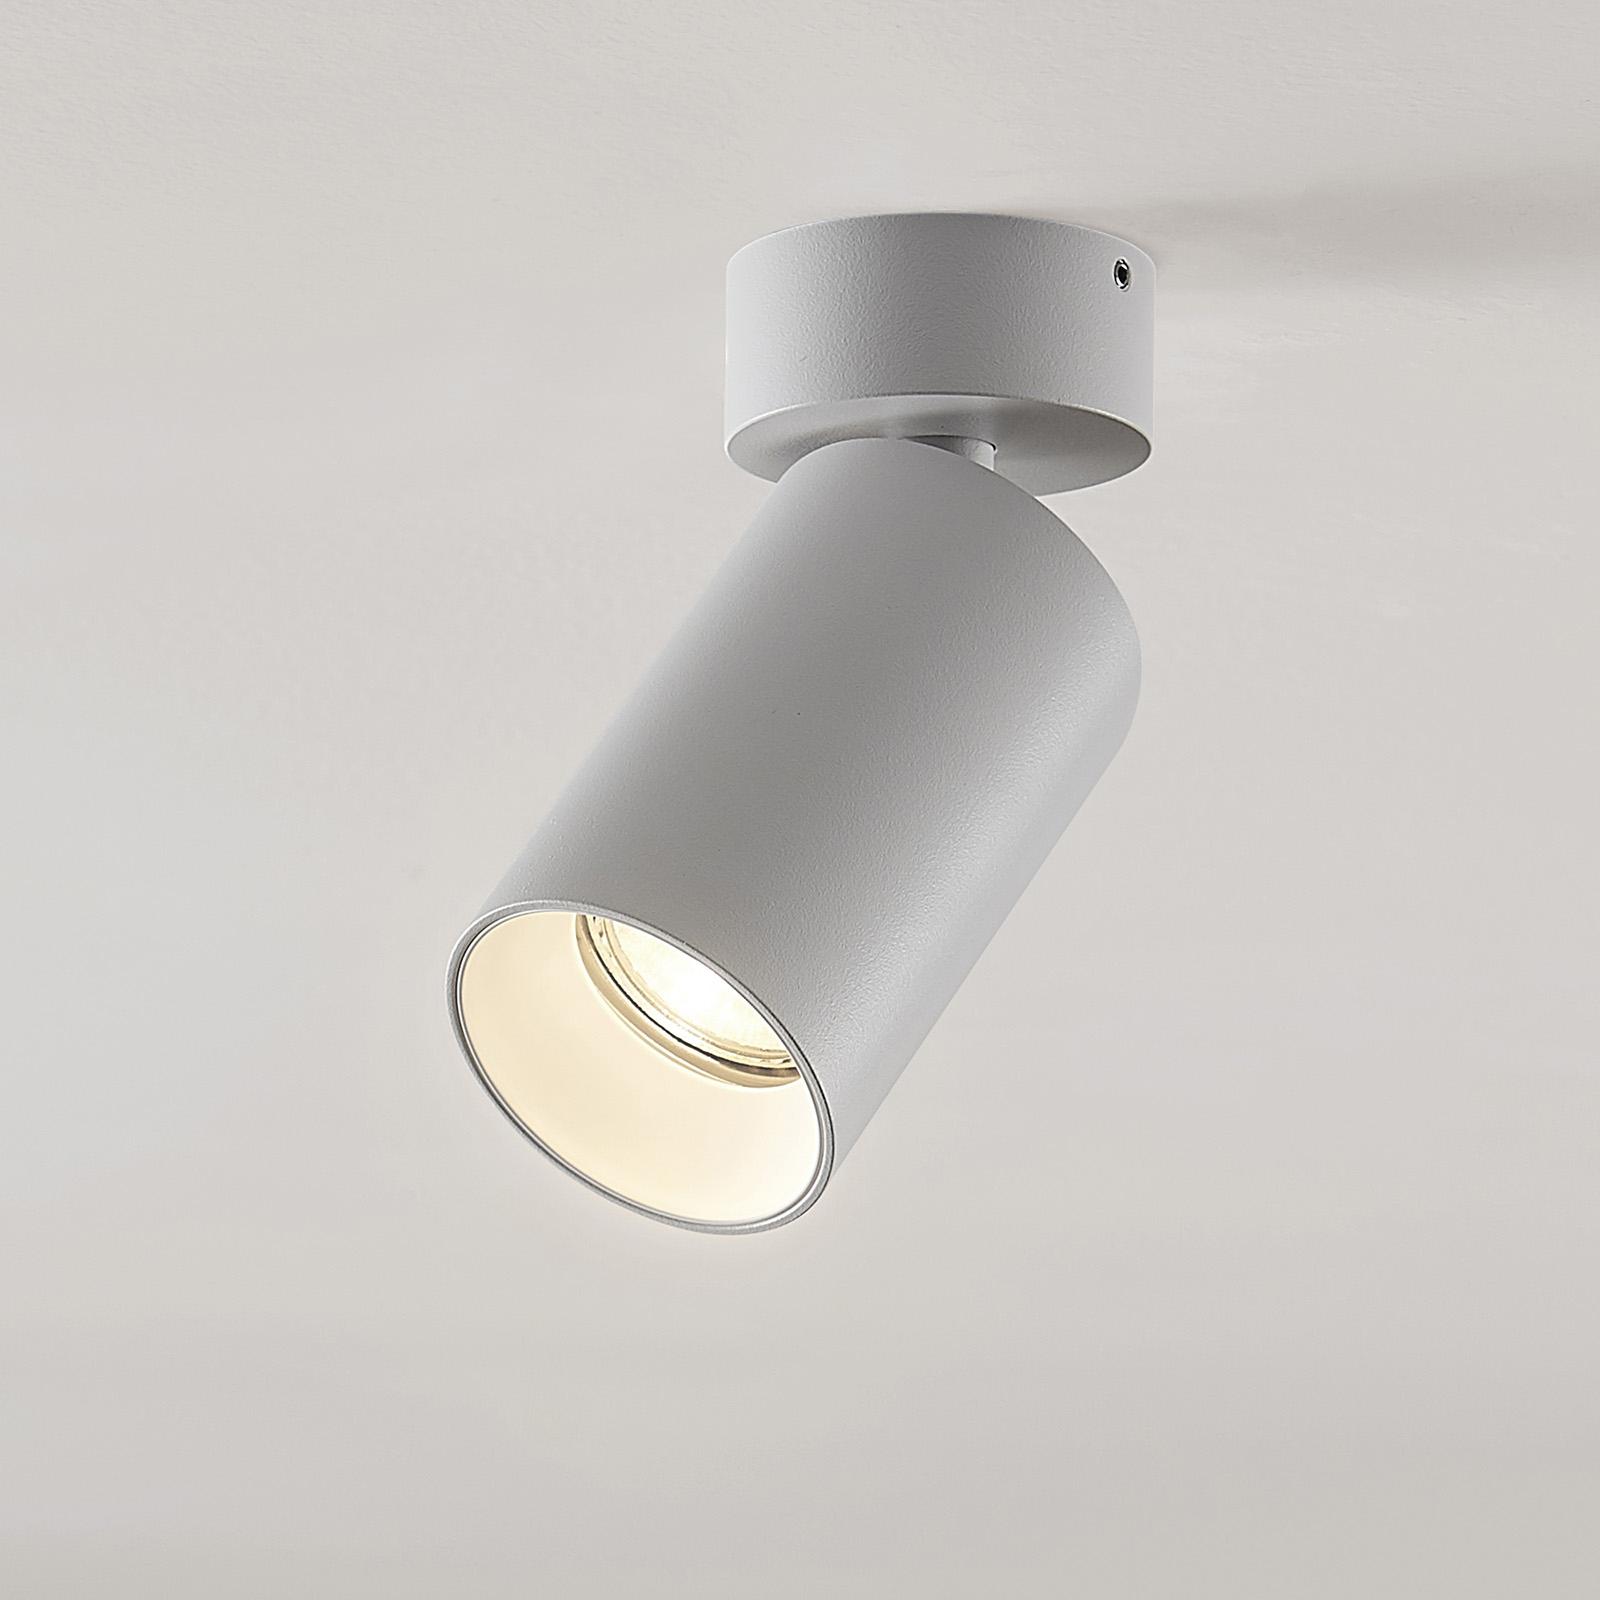 Spotlight Brinja, GU10, vit, 1 lampa, rund